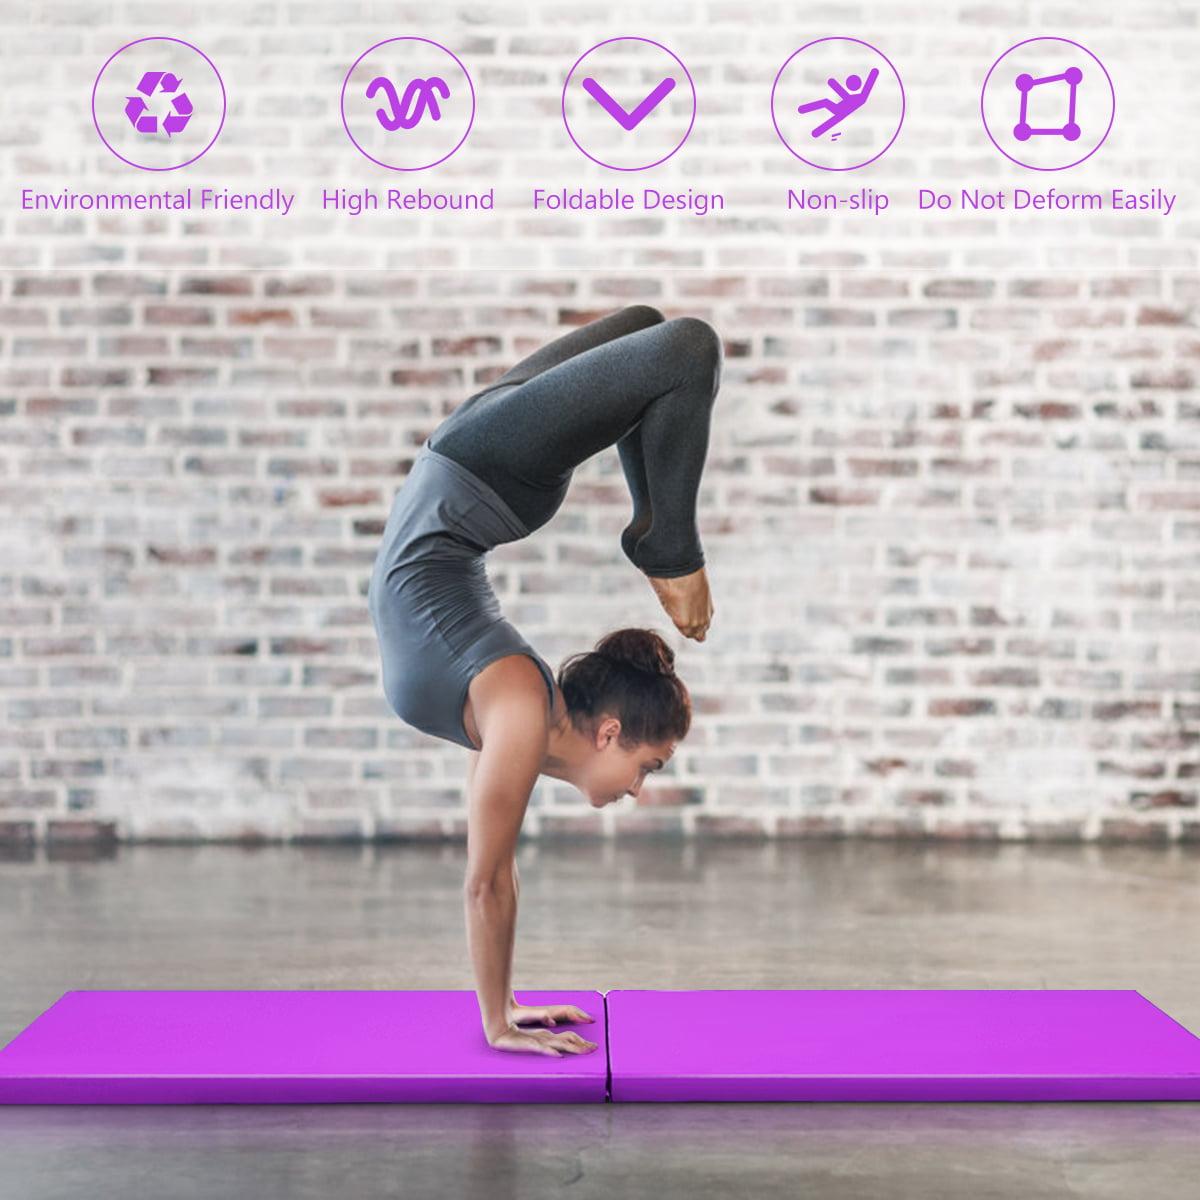 Yoga Home Gym Exercise Workout Mat Athletic Bar Gymnastics Mat Exercise Mat 2x6 Tri-Fold 2 Thick Folding Exercise Tumble Mat with 2 Carrying Handles for Gymnastics Aerobics Mixed Martial Arts